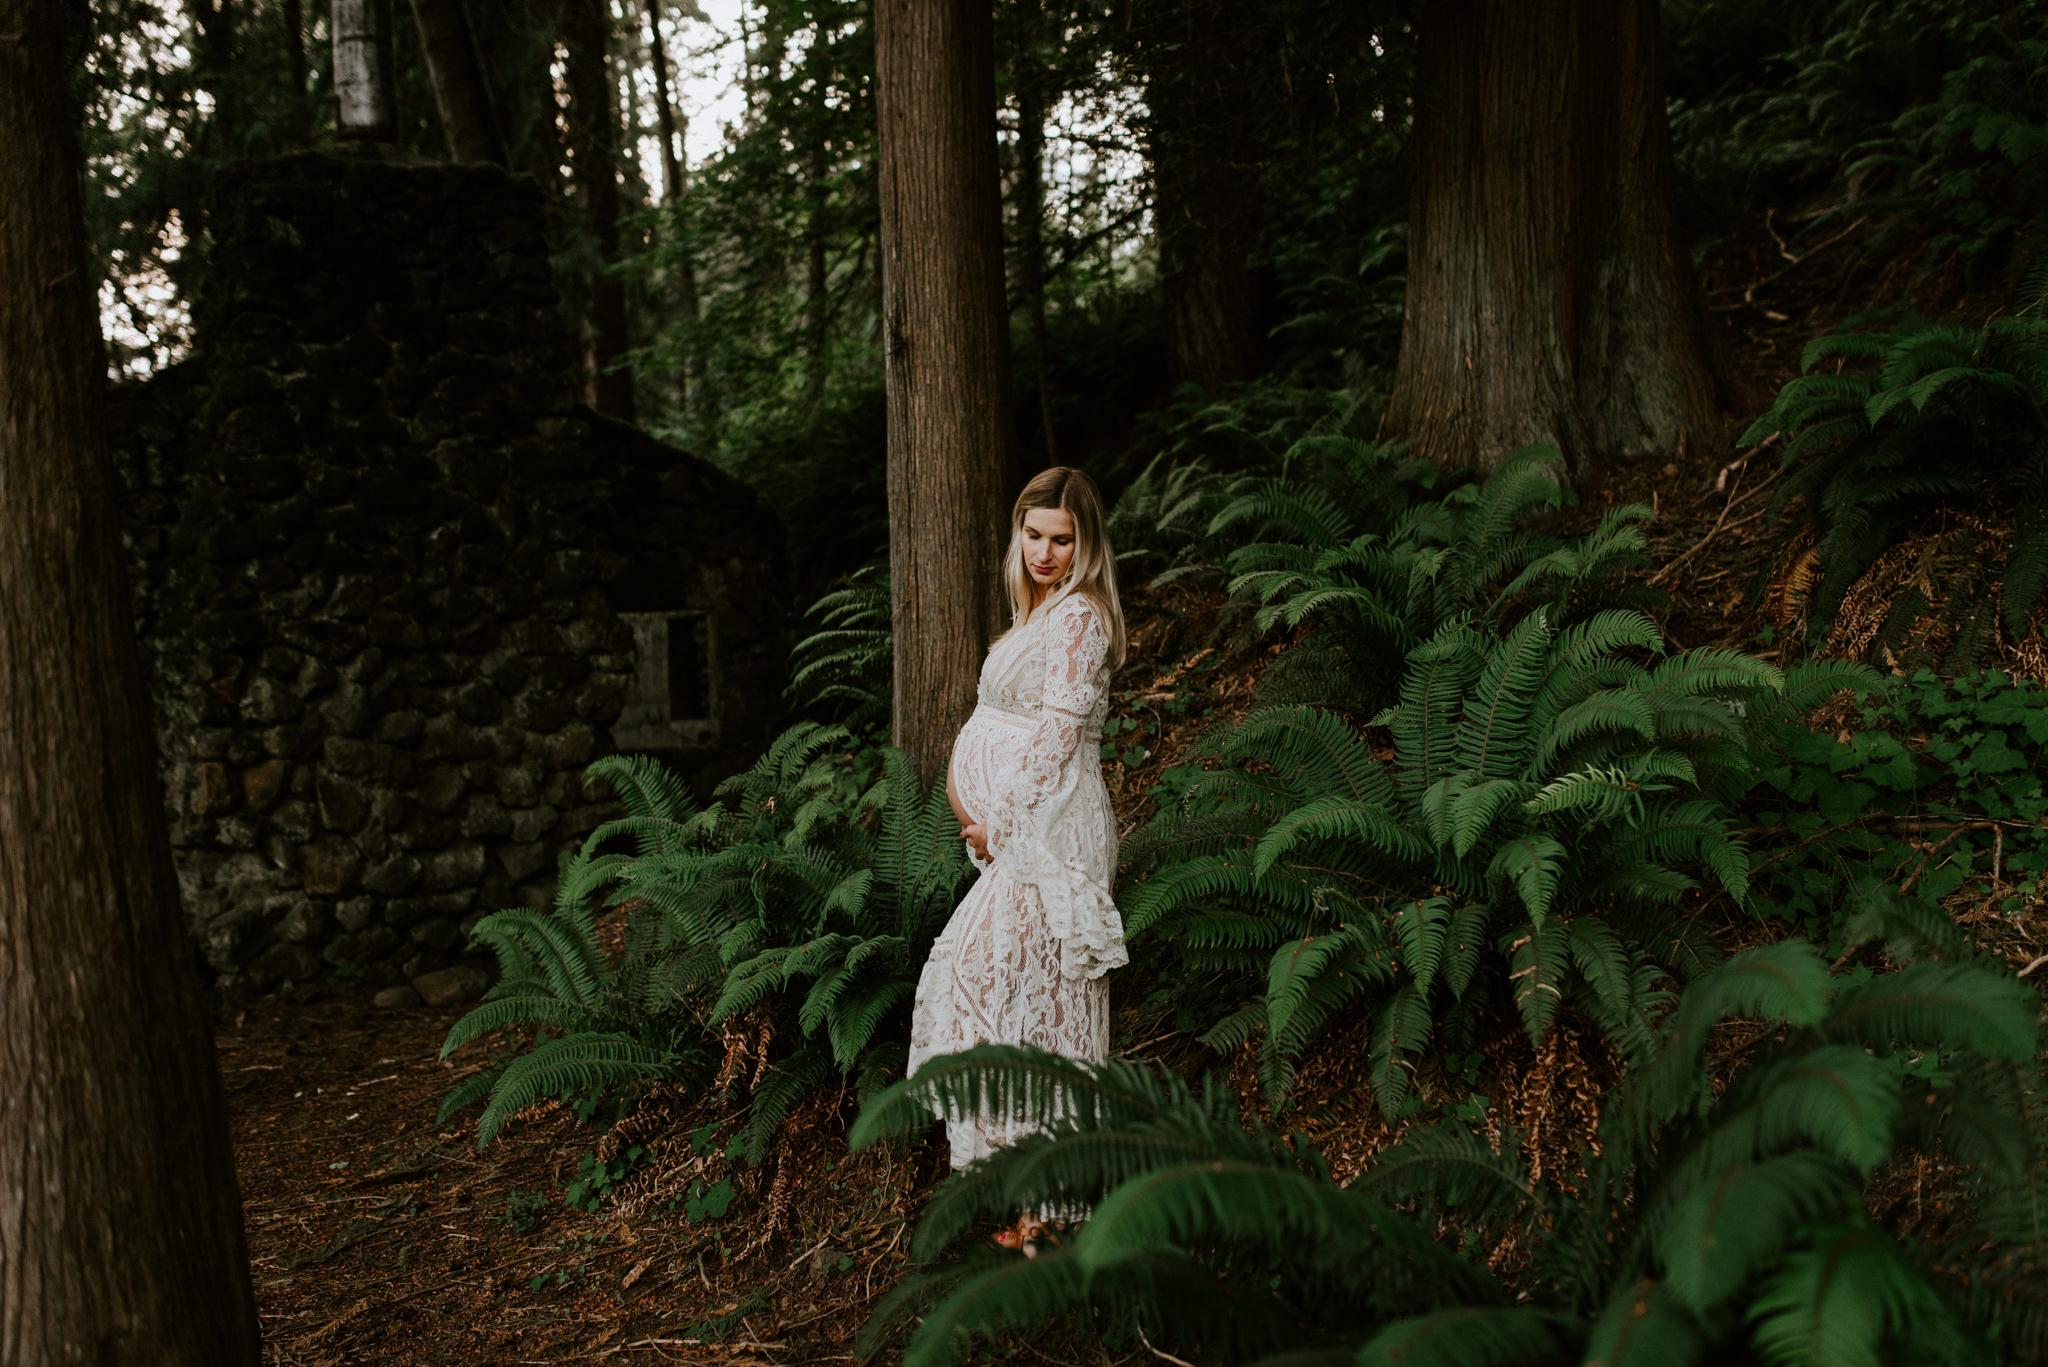 intimate-emotive-maternity-session-skamania-stone-house-columbia-river-gorge-white-free-people-lace-kimono-portland-maternity-photographer-kerlyn-van-gelder-photography